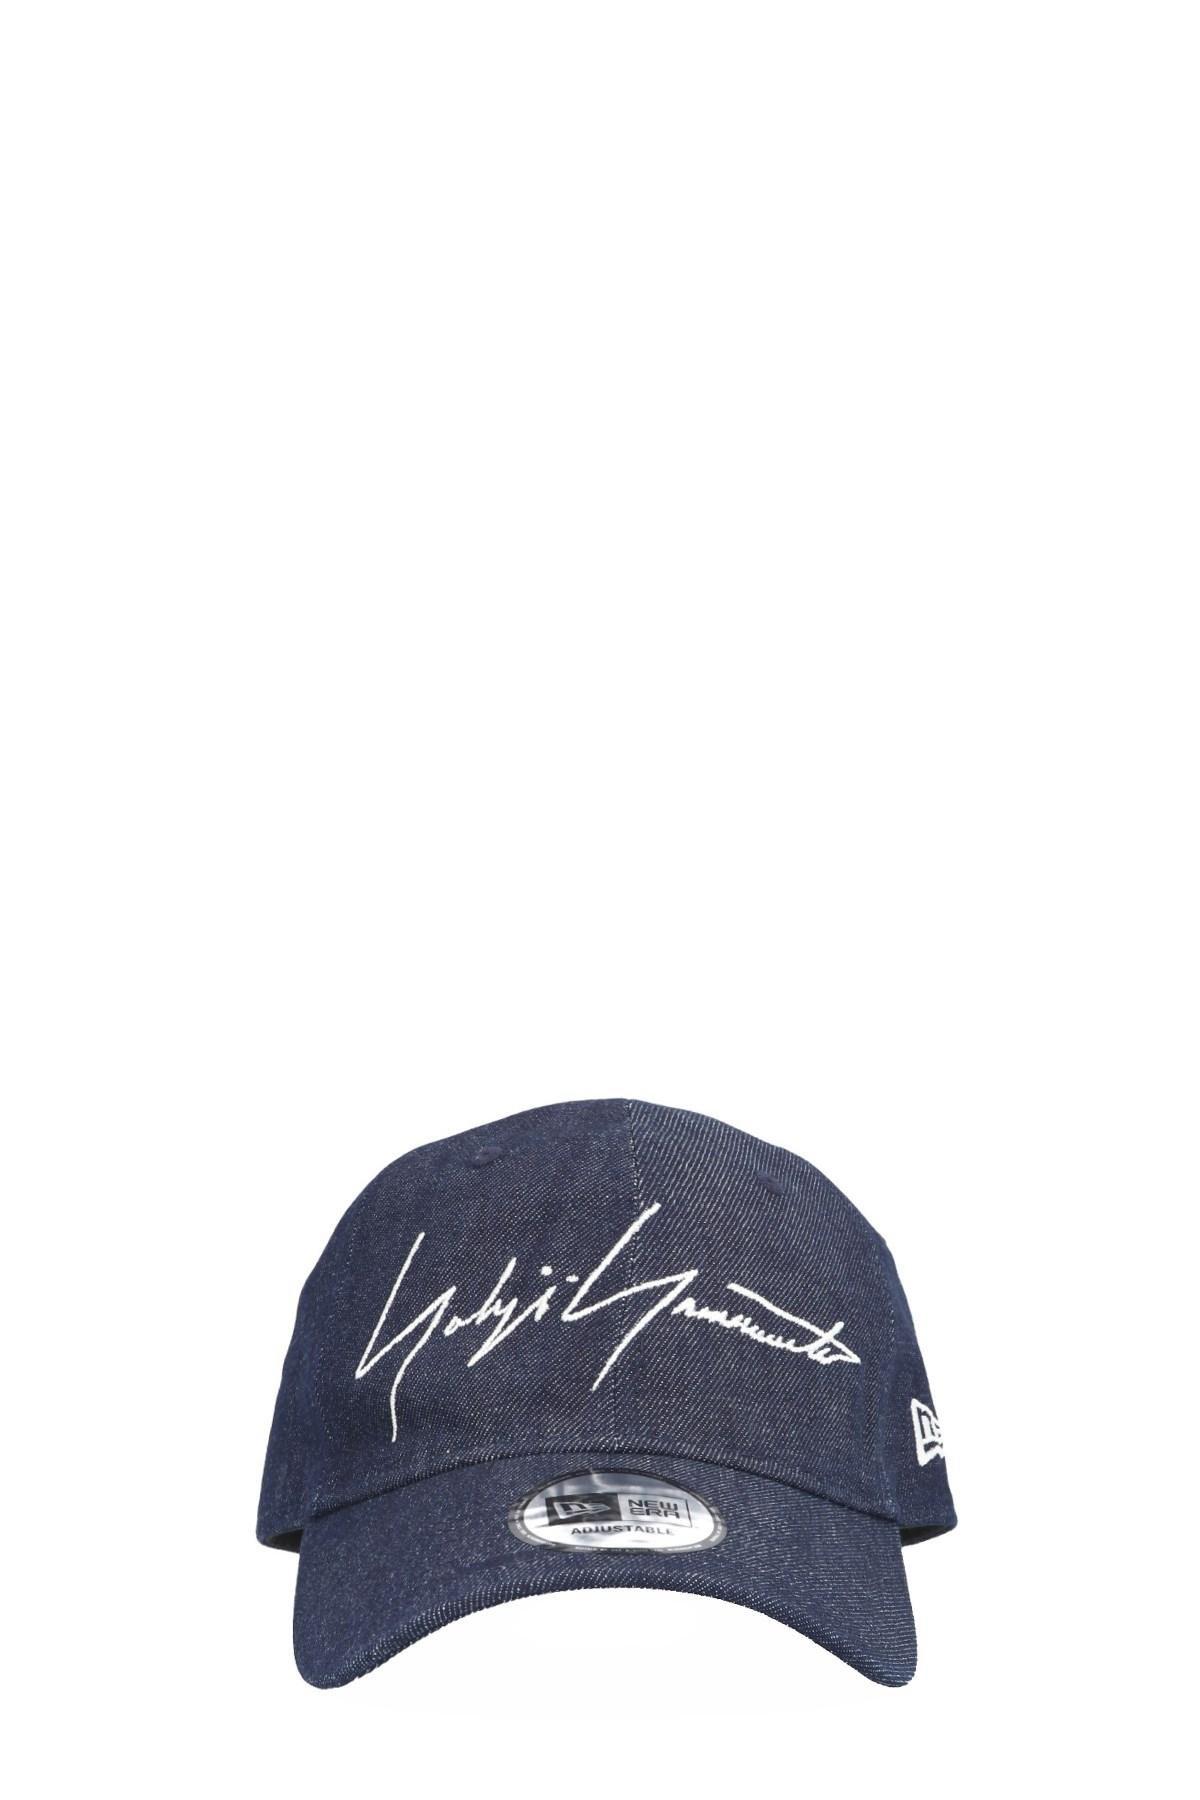 7311df034cdd8 Yohji Yamamoto Collab. New Era Cap in Blue for Men - Lyst